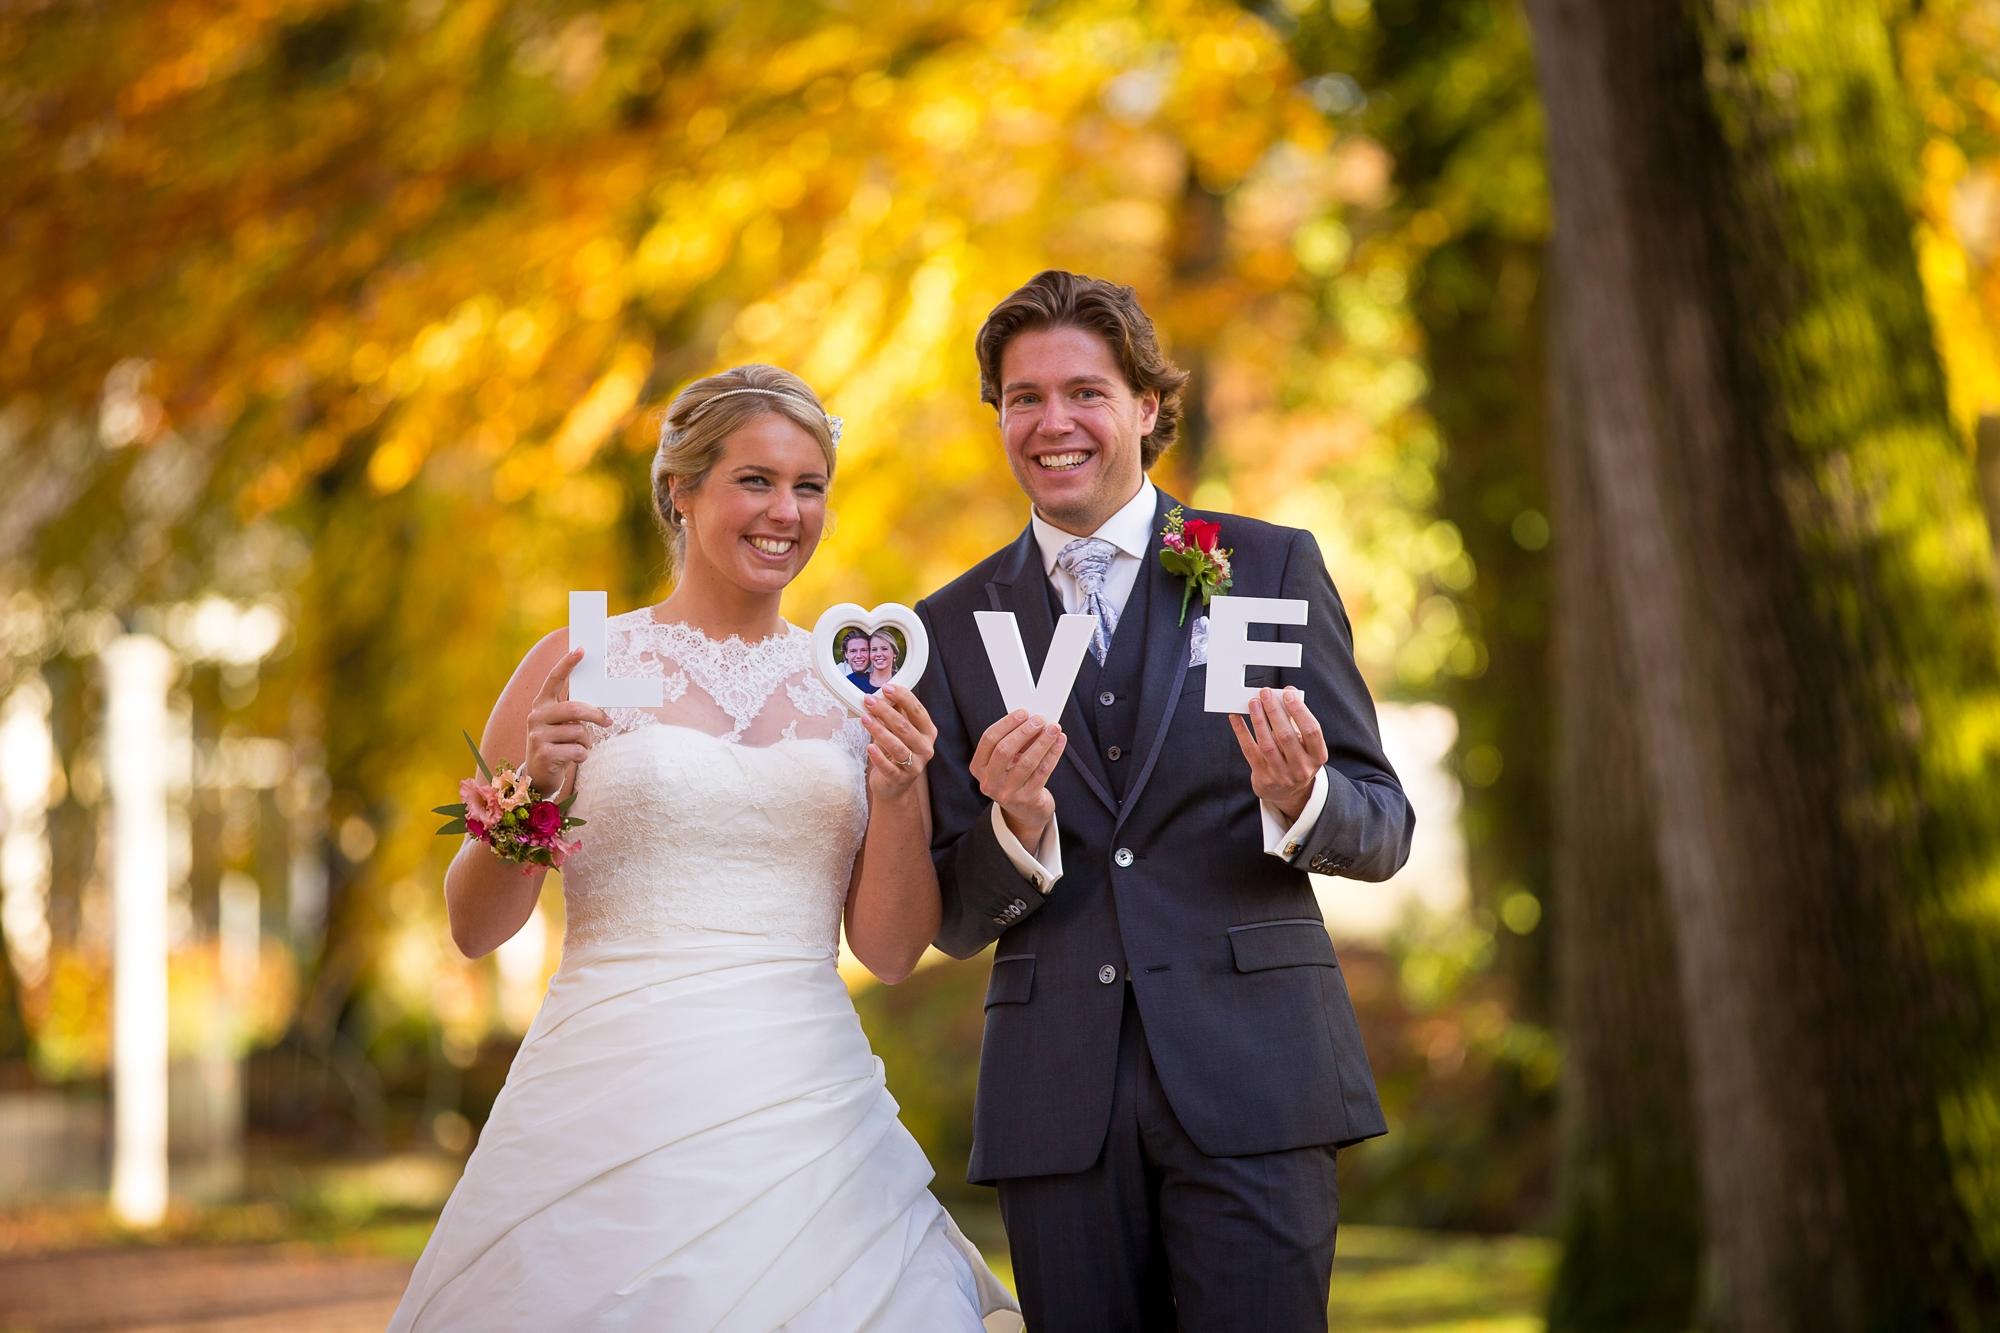 bruidsfotografie-trouwreportage-huwelijksfotografie-bruidsfotograaf-feestfotografie-Ingeborg en Martijn-27.jpg